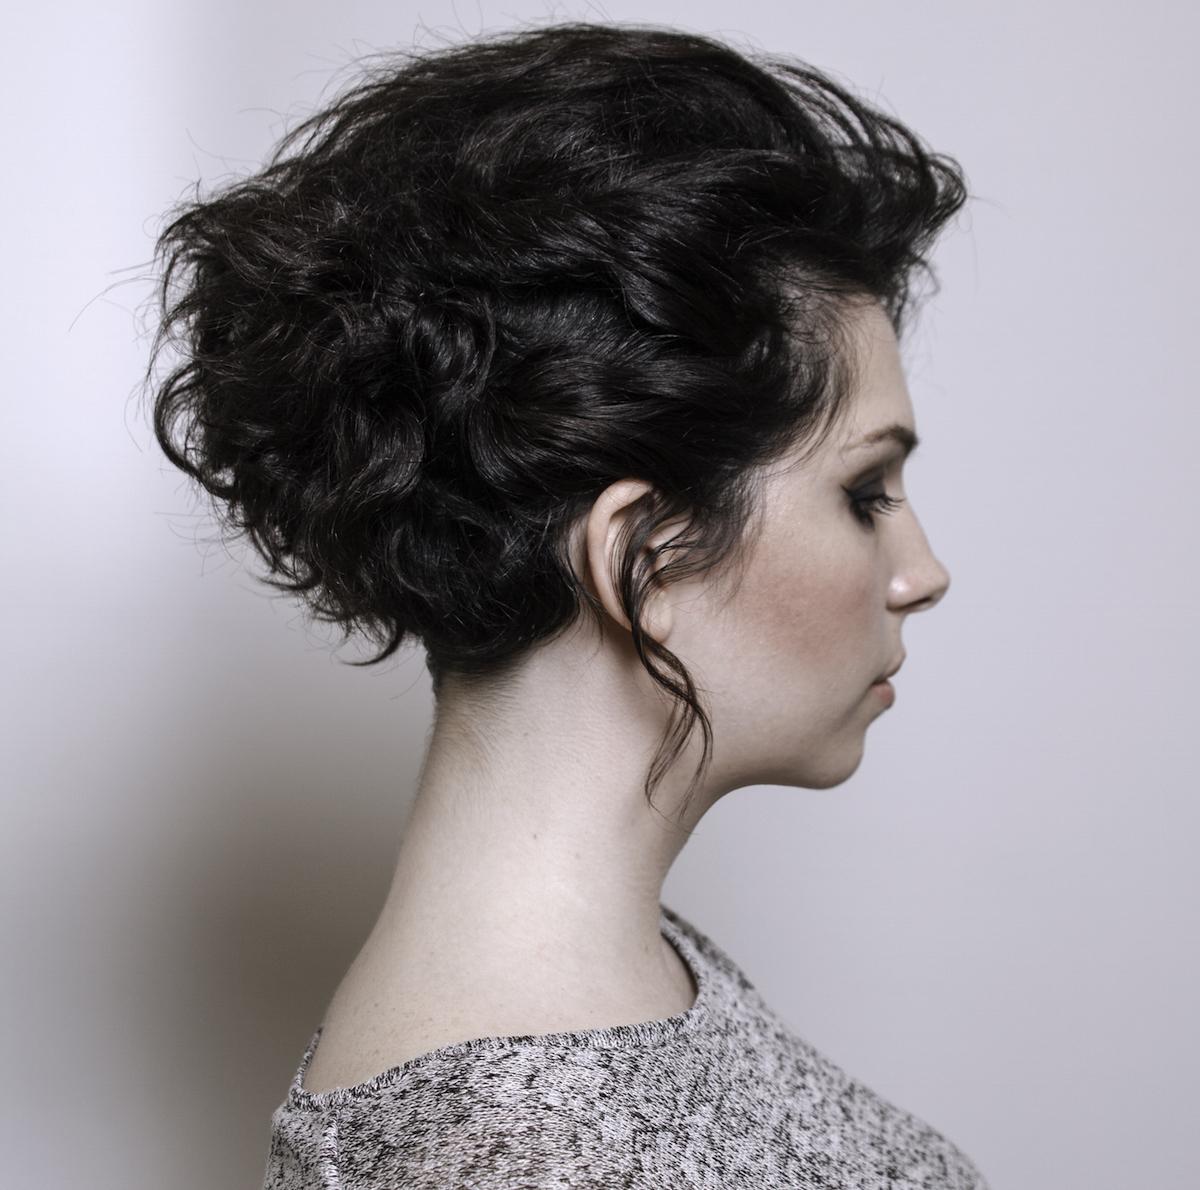 Style by Celso Enrique/Photo courtesy of Salon Eva Michelle